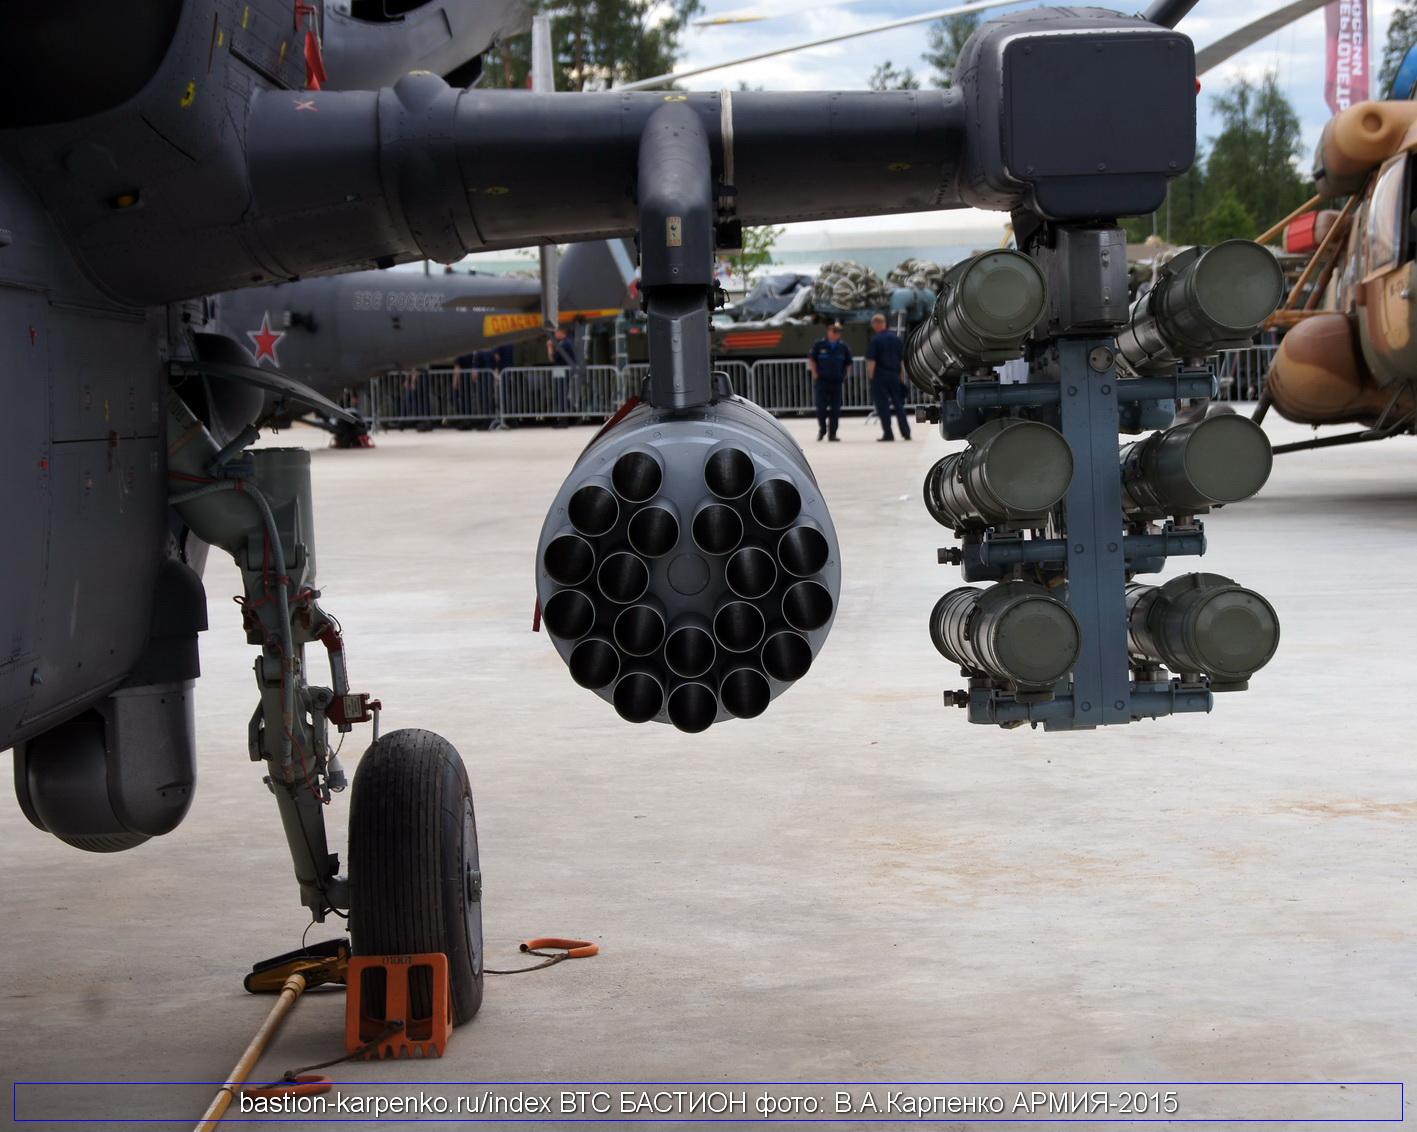 ka-52k_armiy-2015_14.JPG